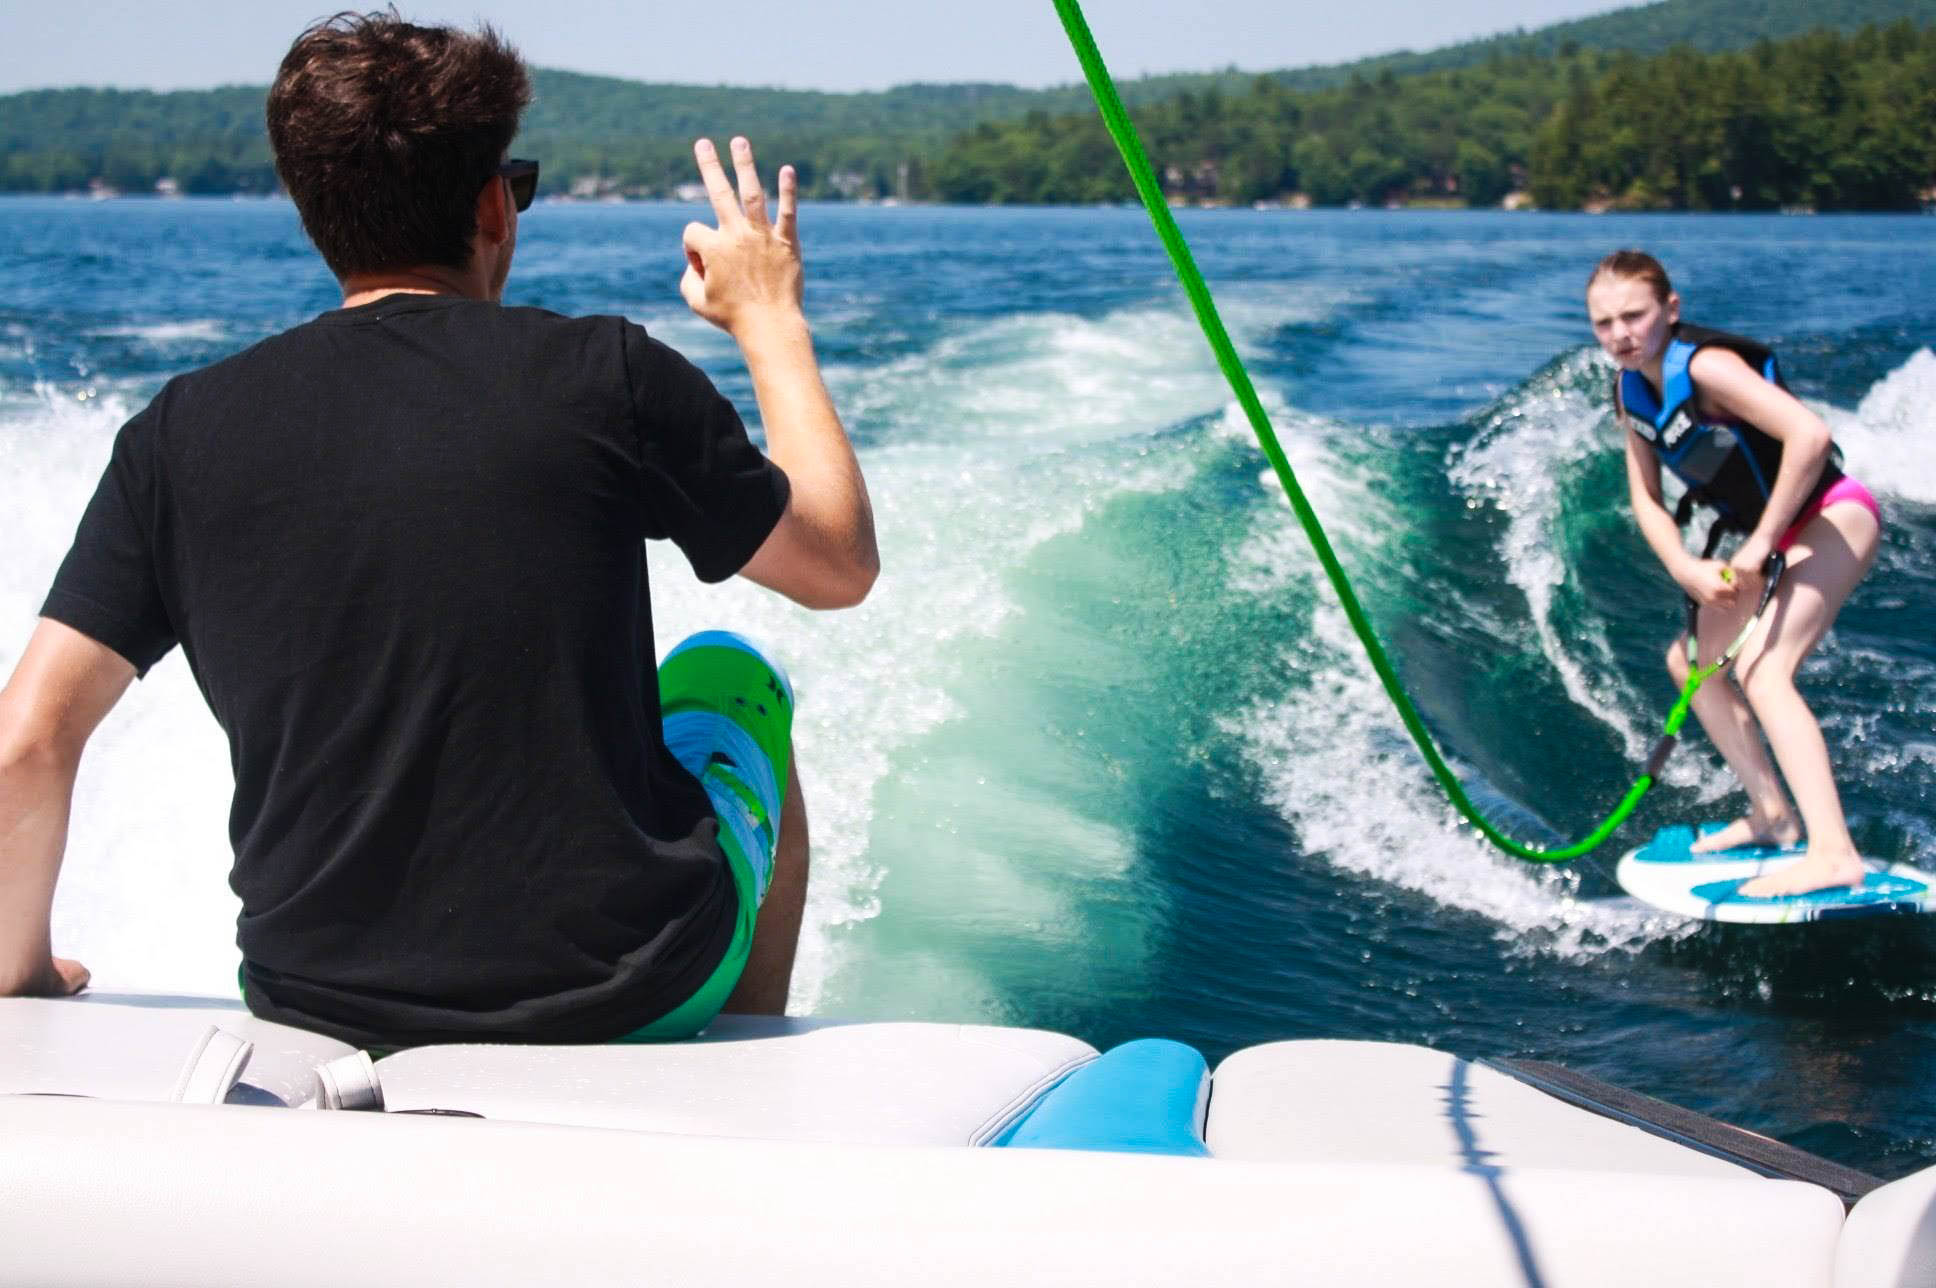 Summer camp lake instructor wakesurf